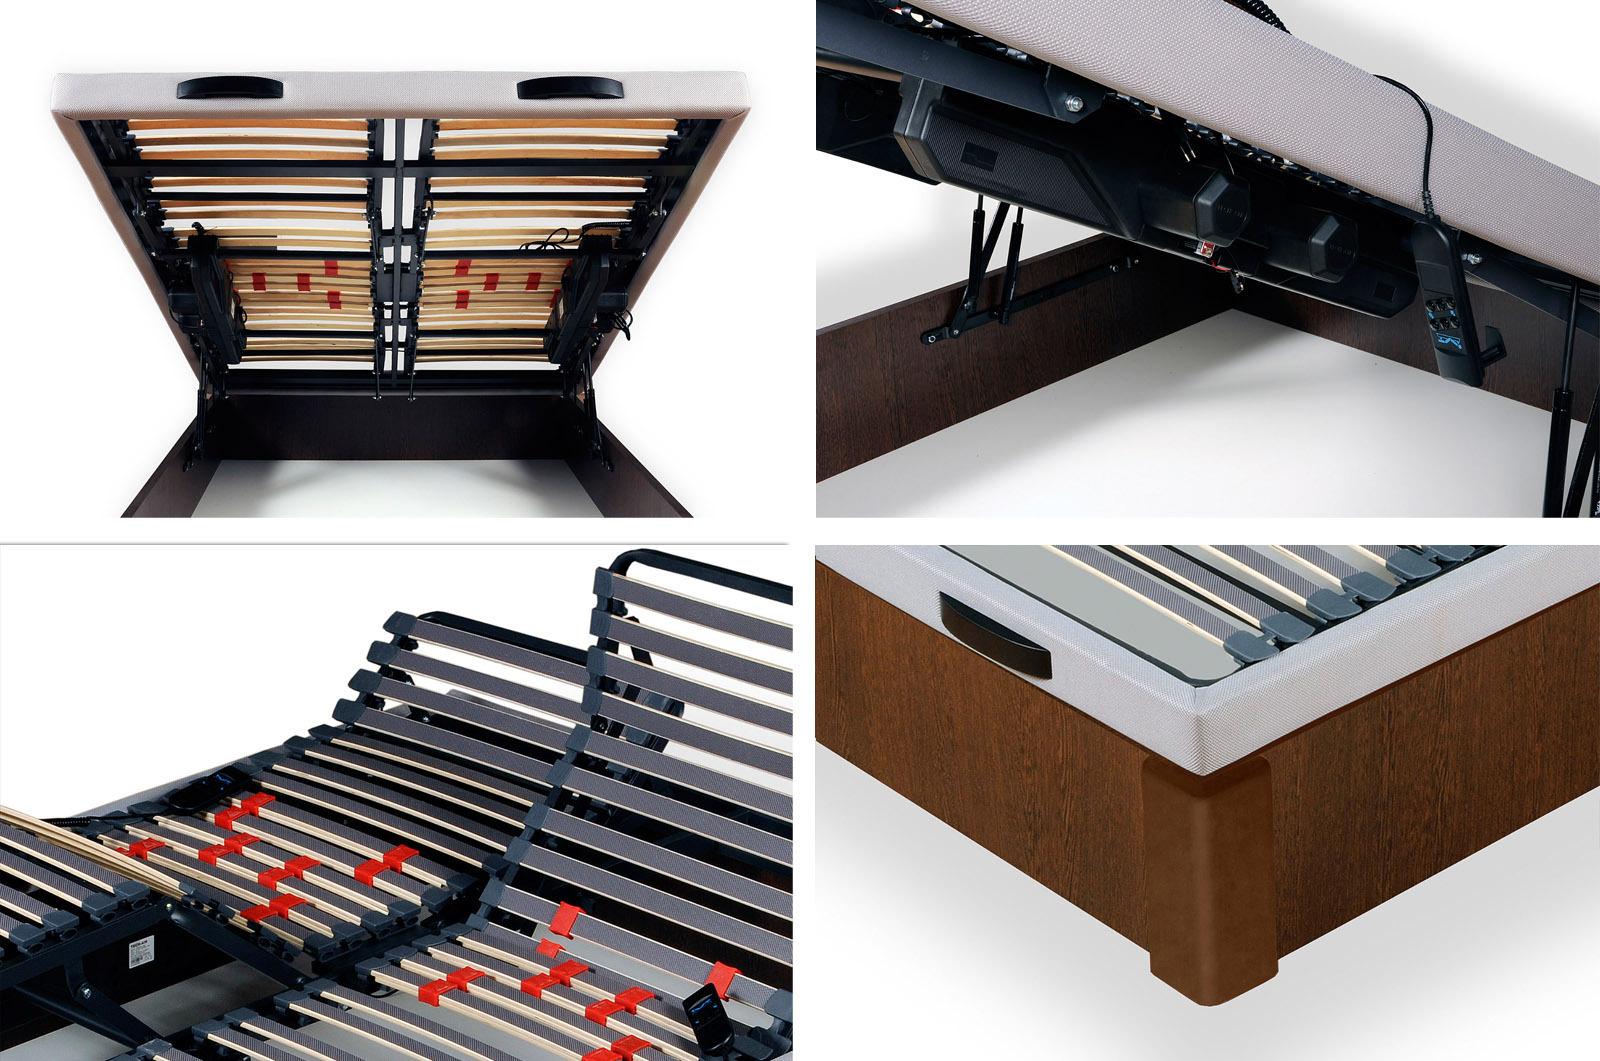 CANAPE ARTICULADO ELECTRICO (UN SOLO CANAPE/ SOMIER CON DOBLE ARTICULACION)-150 x 190 cm